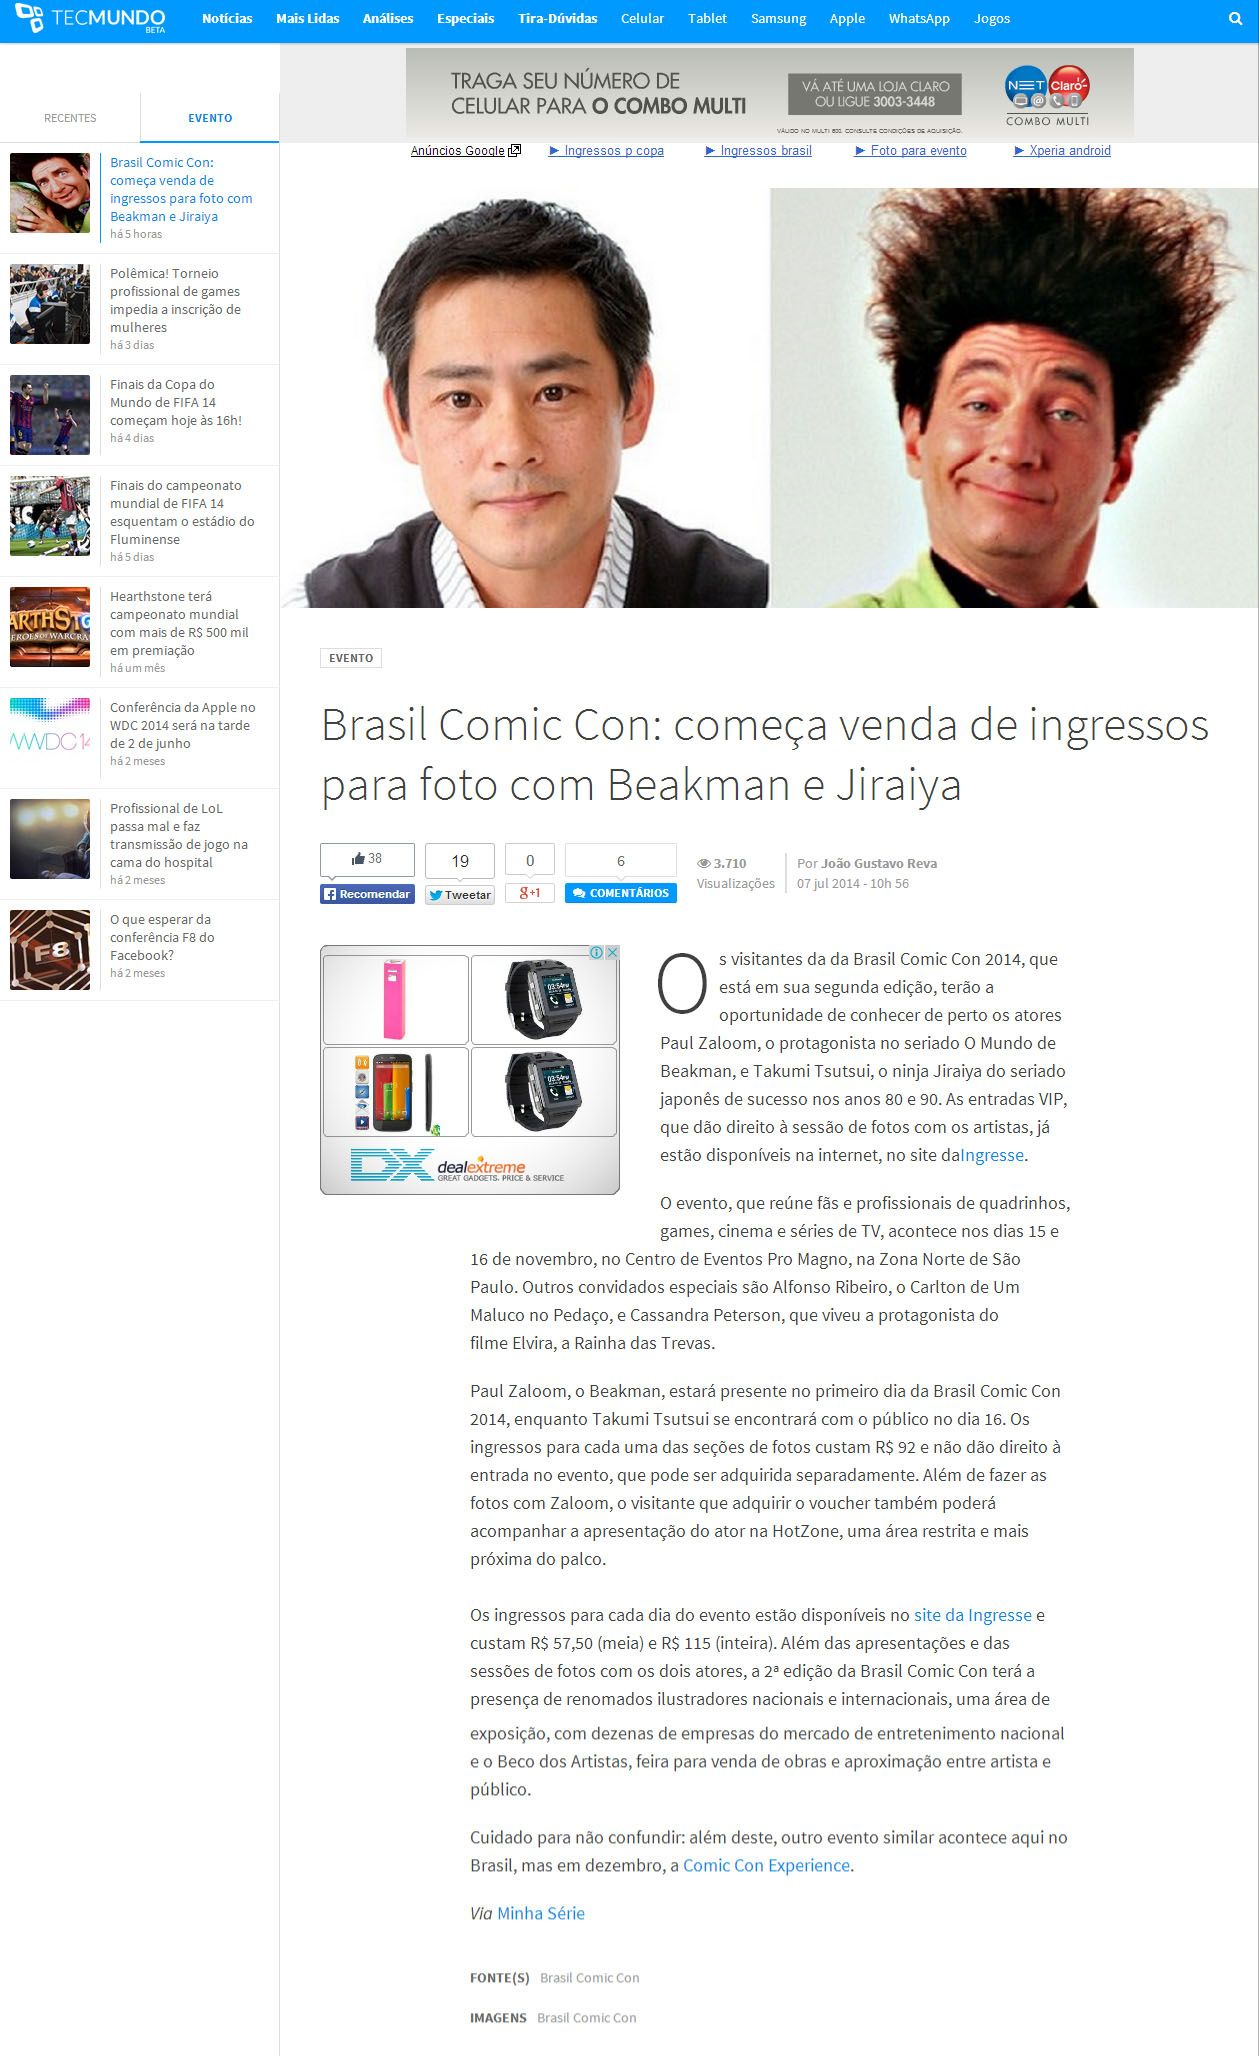 Brasil Comic Con: começa venda de ingressos para foto com Beakman e Jiraiya